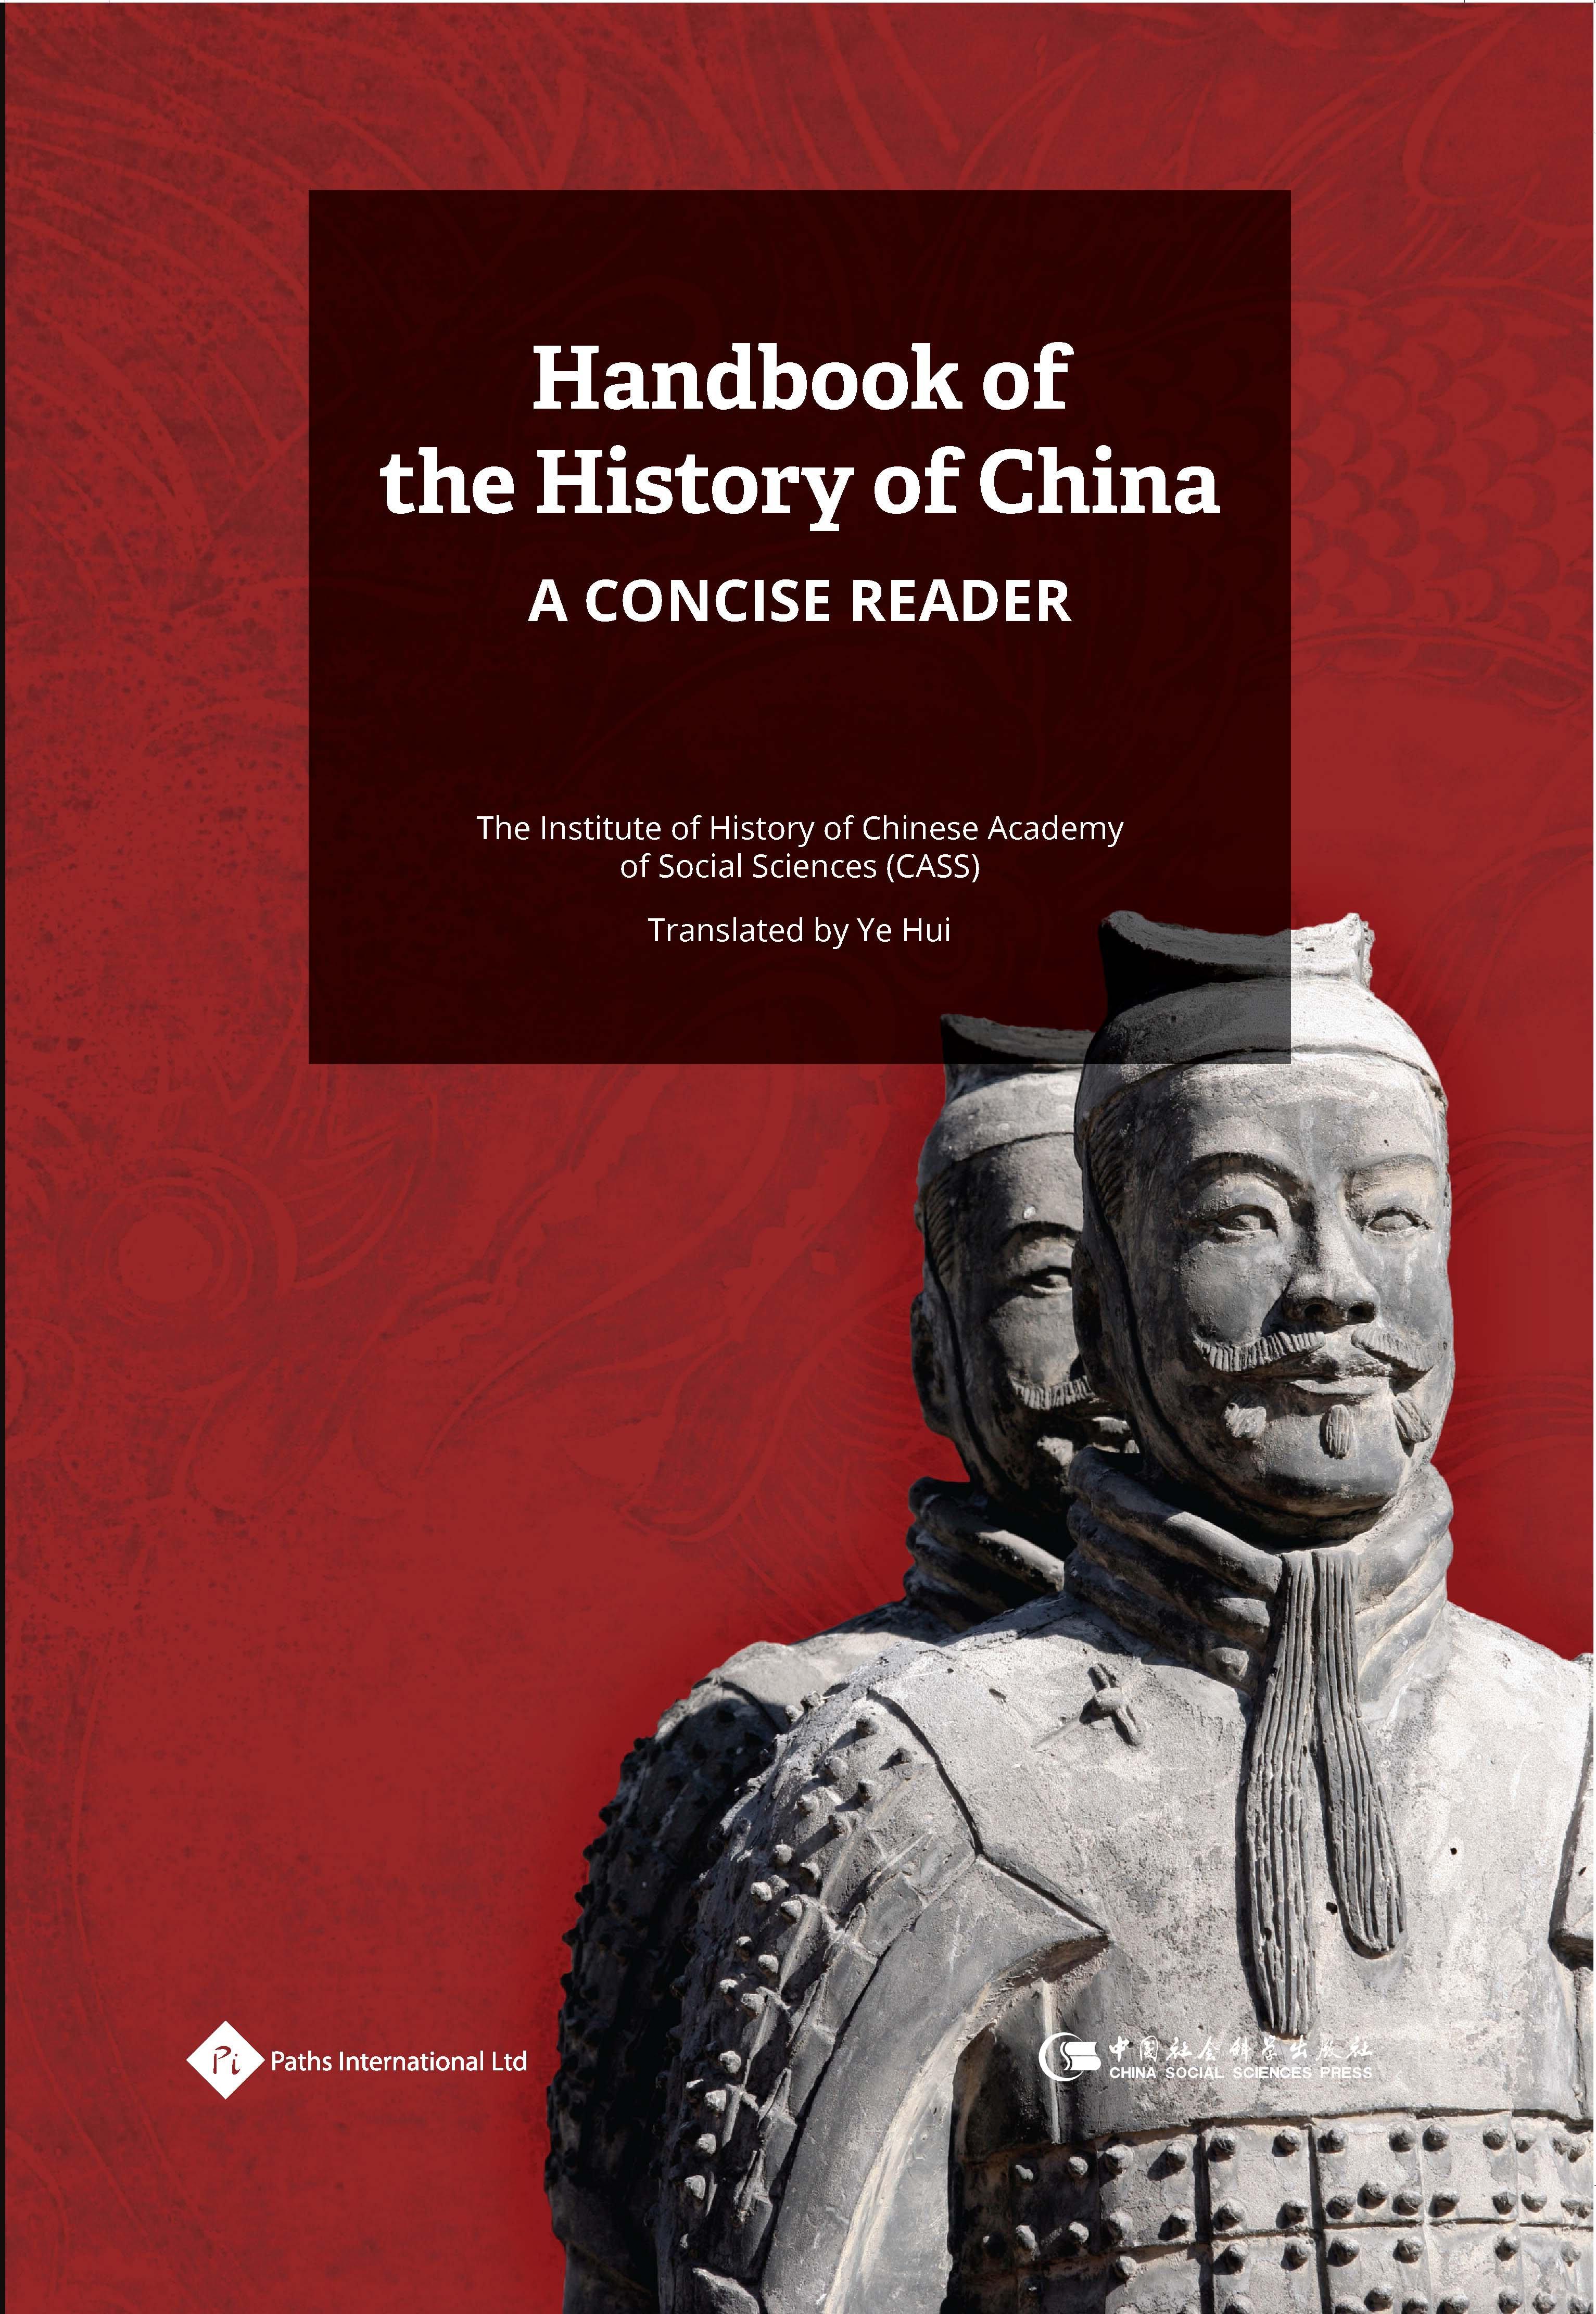 Qin Shi Huang's Army